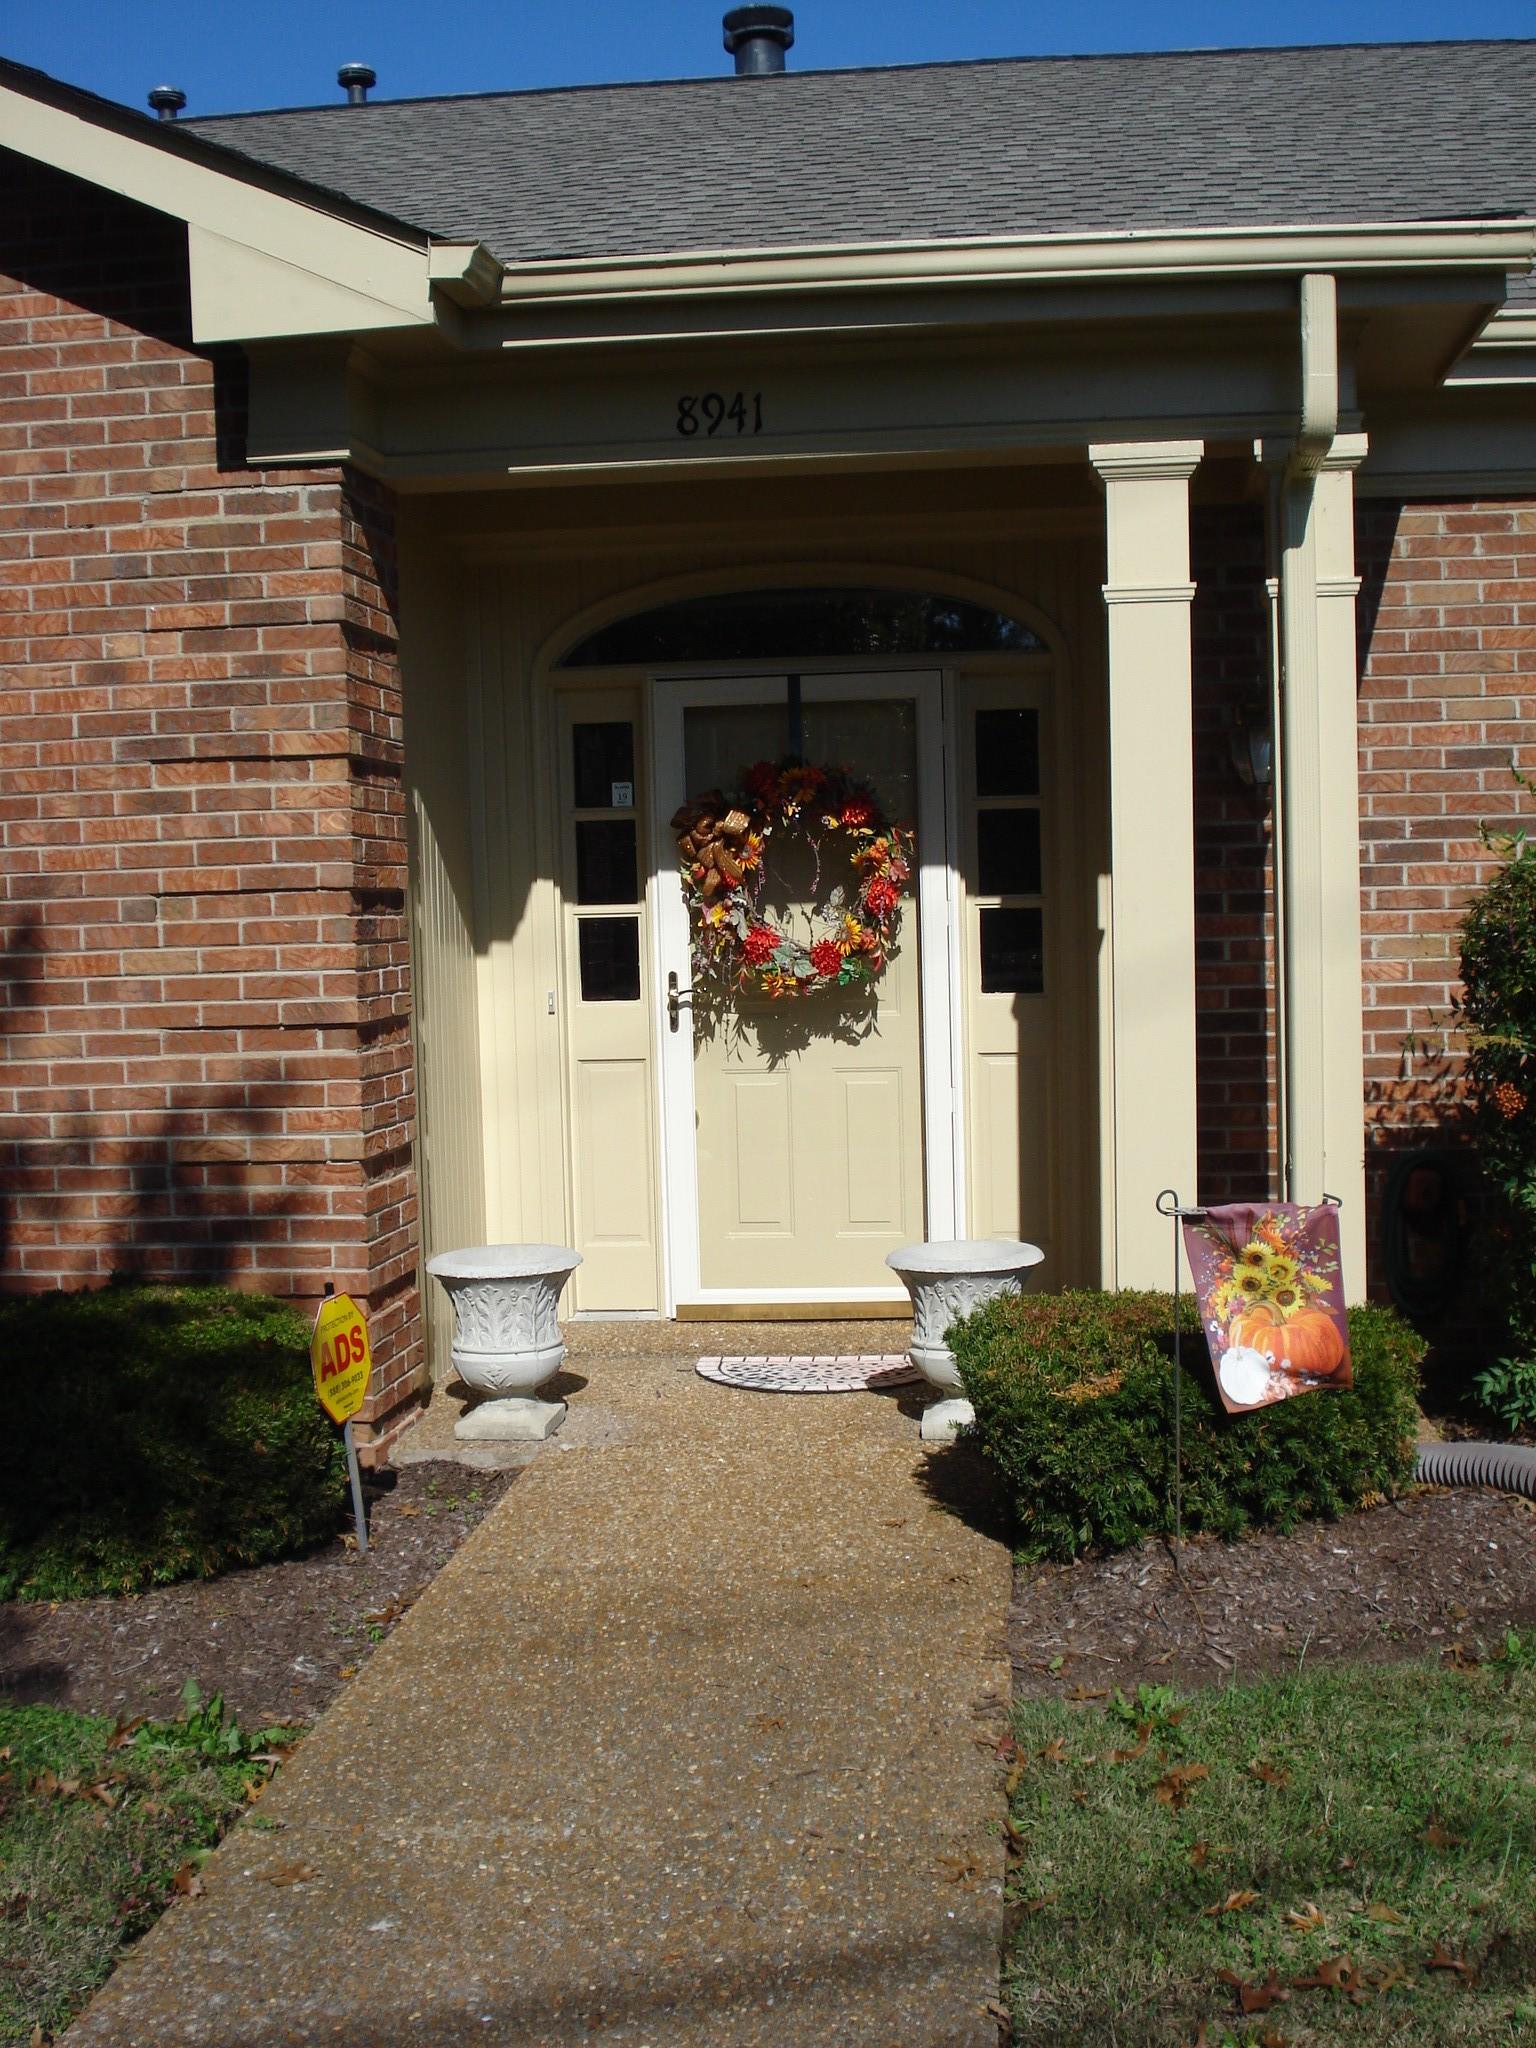 8941 Sawyer Brown Rd, Nashville, TN 37221 - Nashville, TN real estate listing